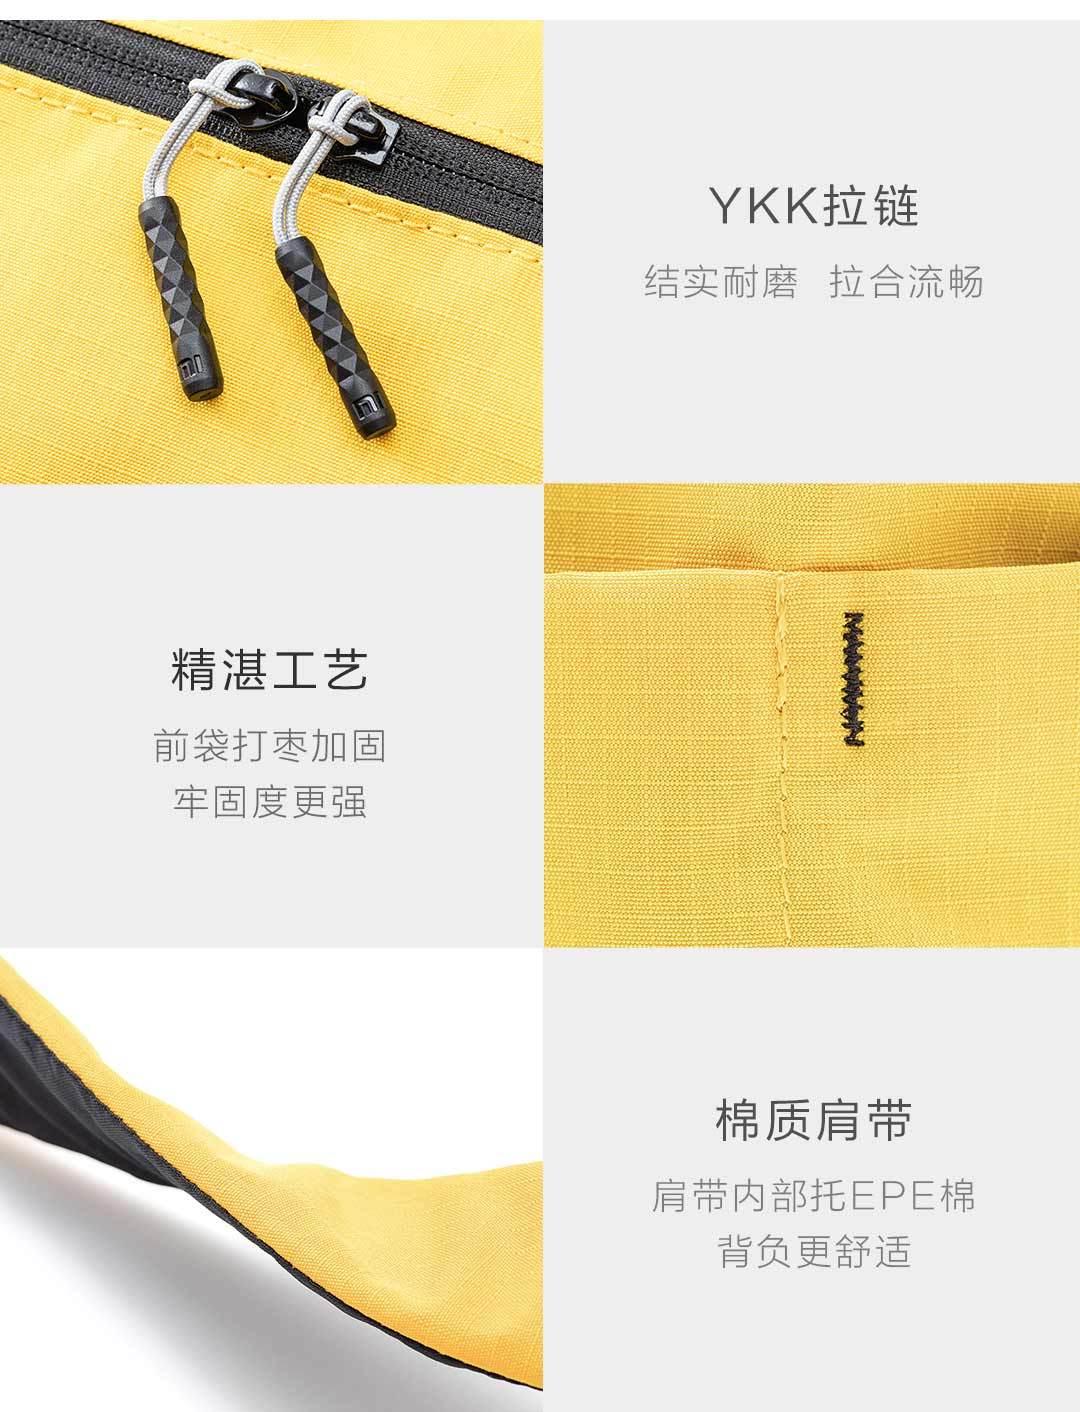 Xiaomi-Mi-Compact-Backpack-00003